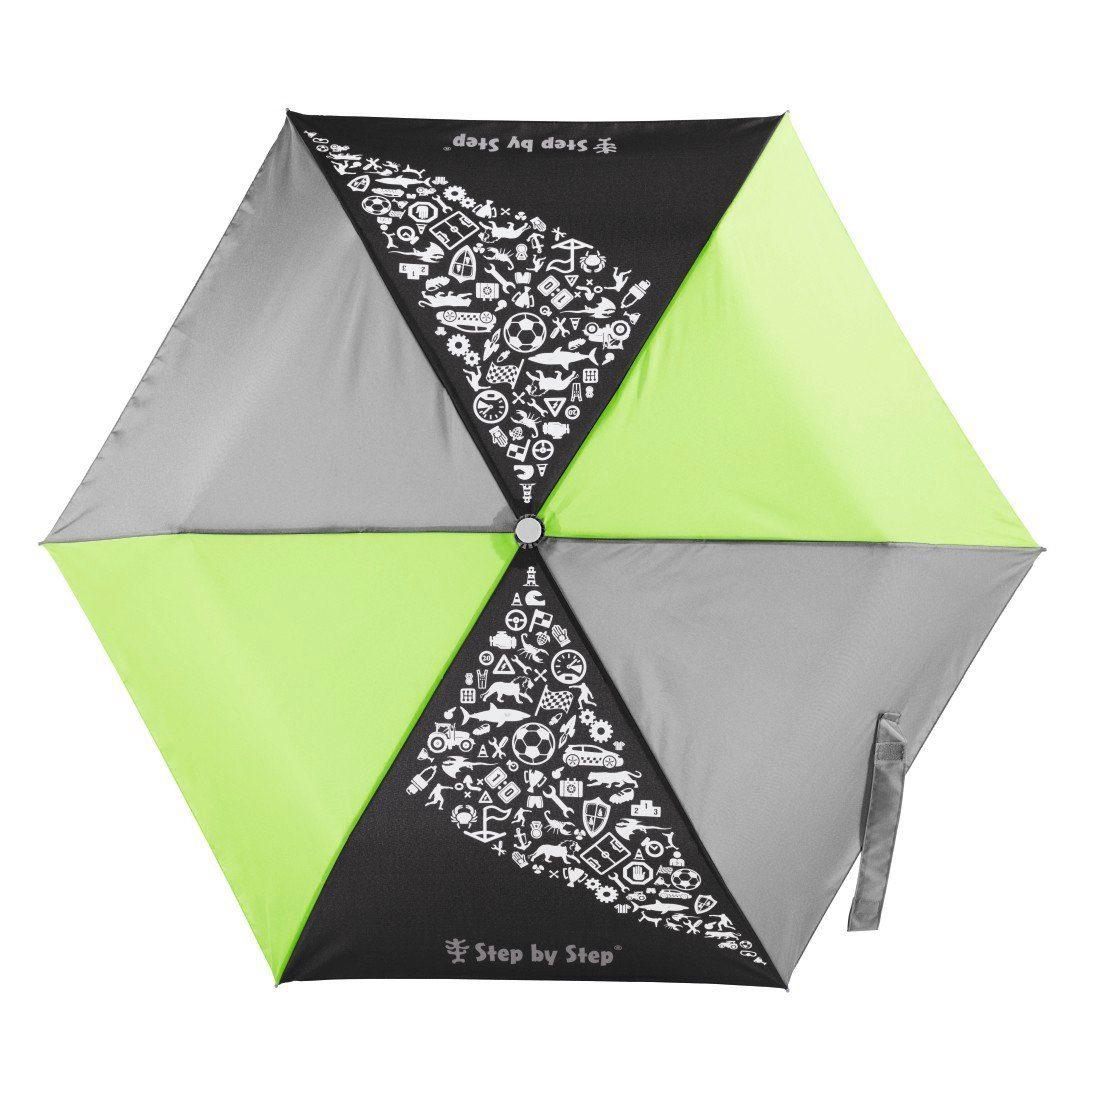 Step by Step Regenschirm Jungen Kinder Taschenschirm Grün Grau »Green & Grey Mini Rain Effect« | Accessoires > Regenschirme > Taschenschirme | STEP BY STEP